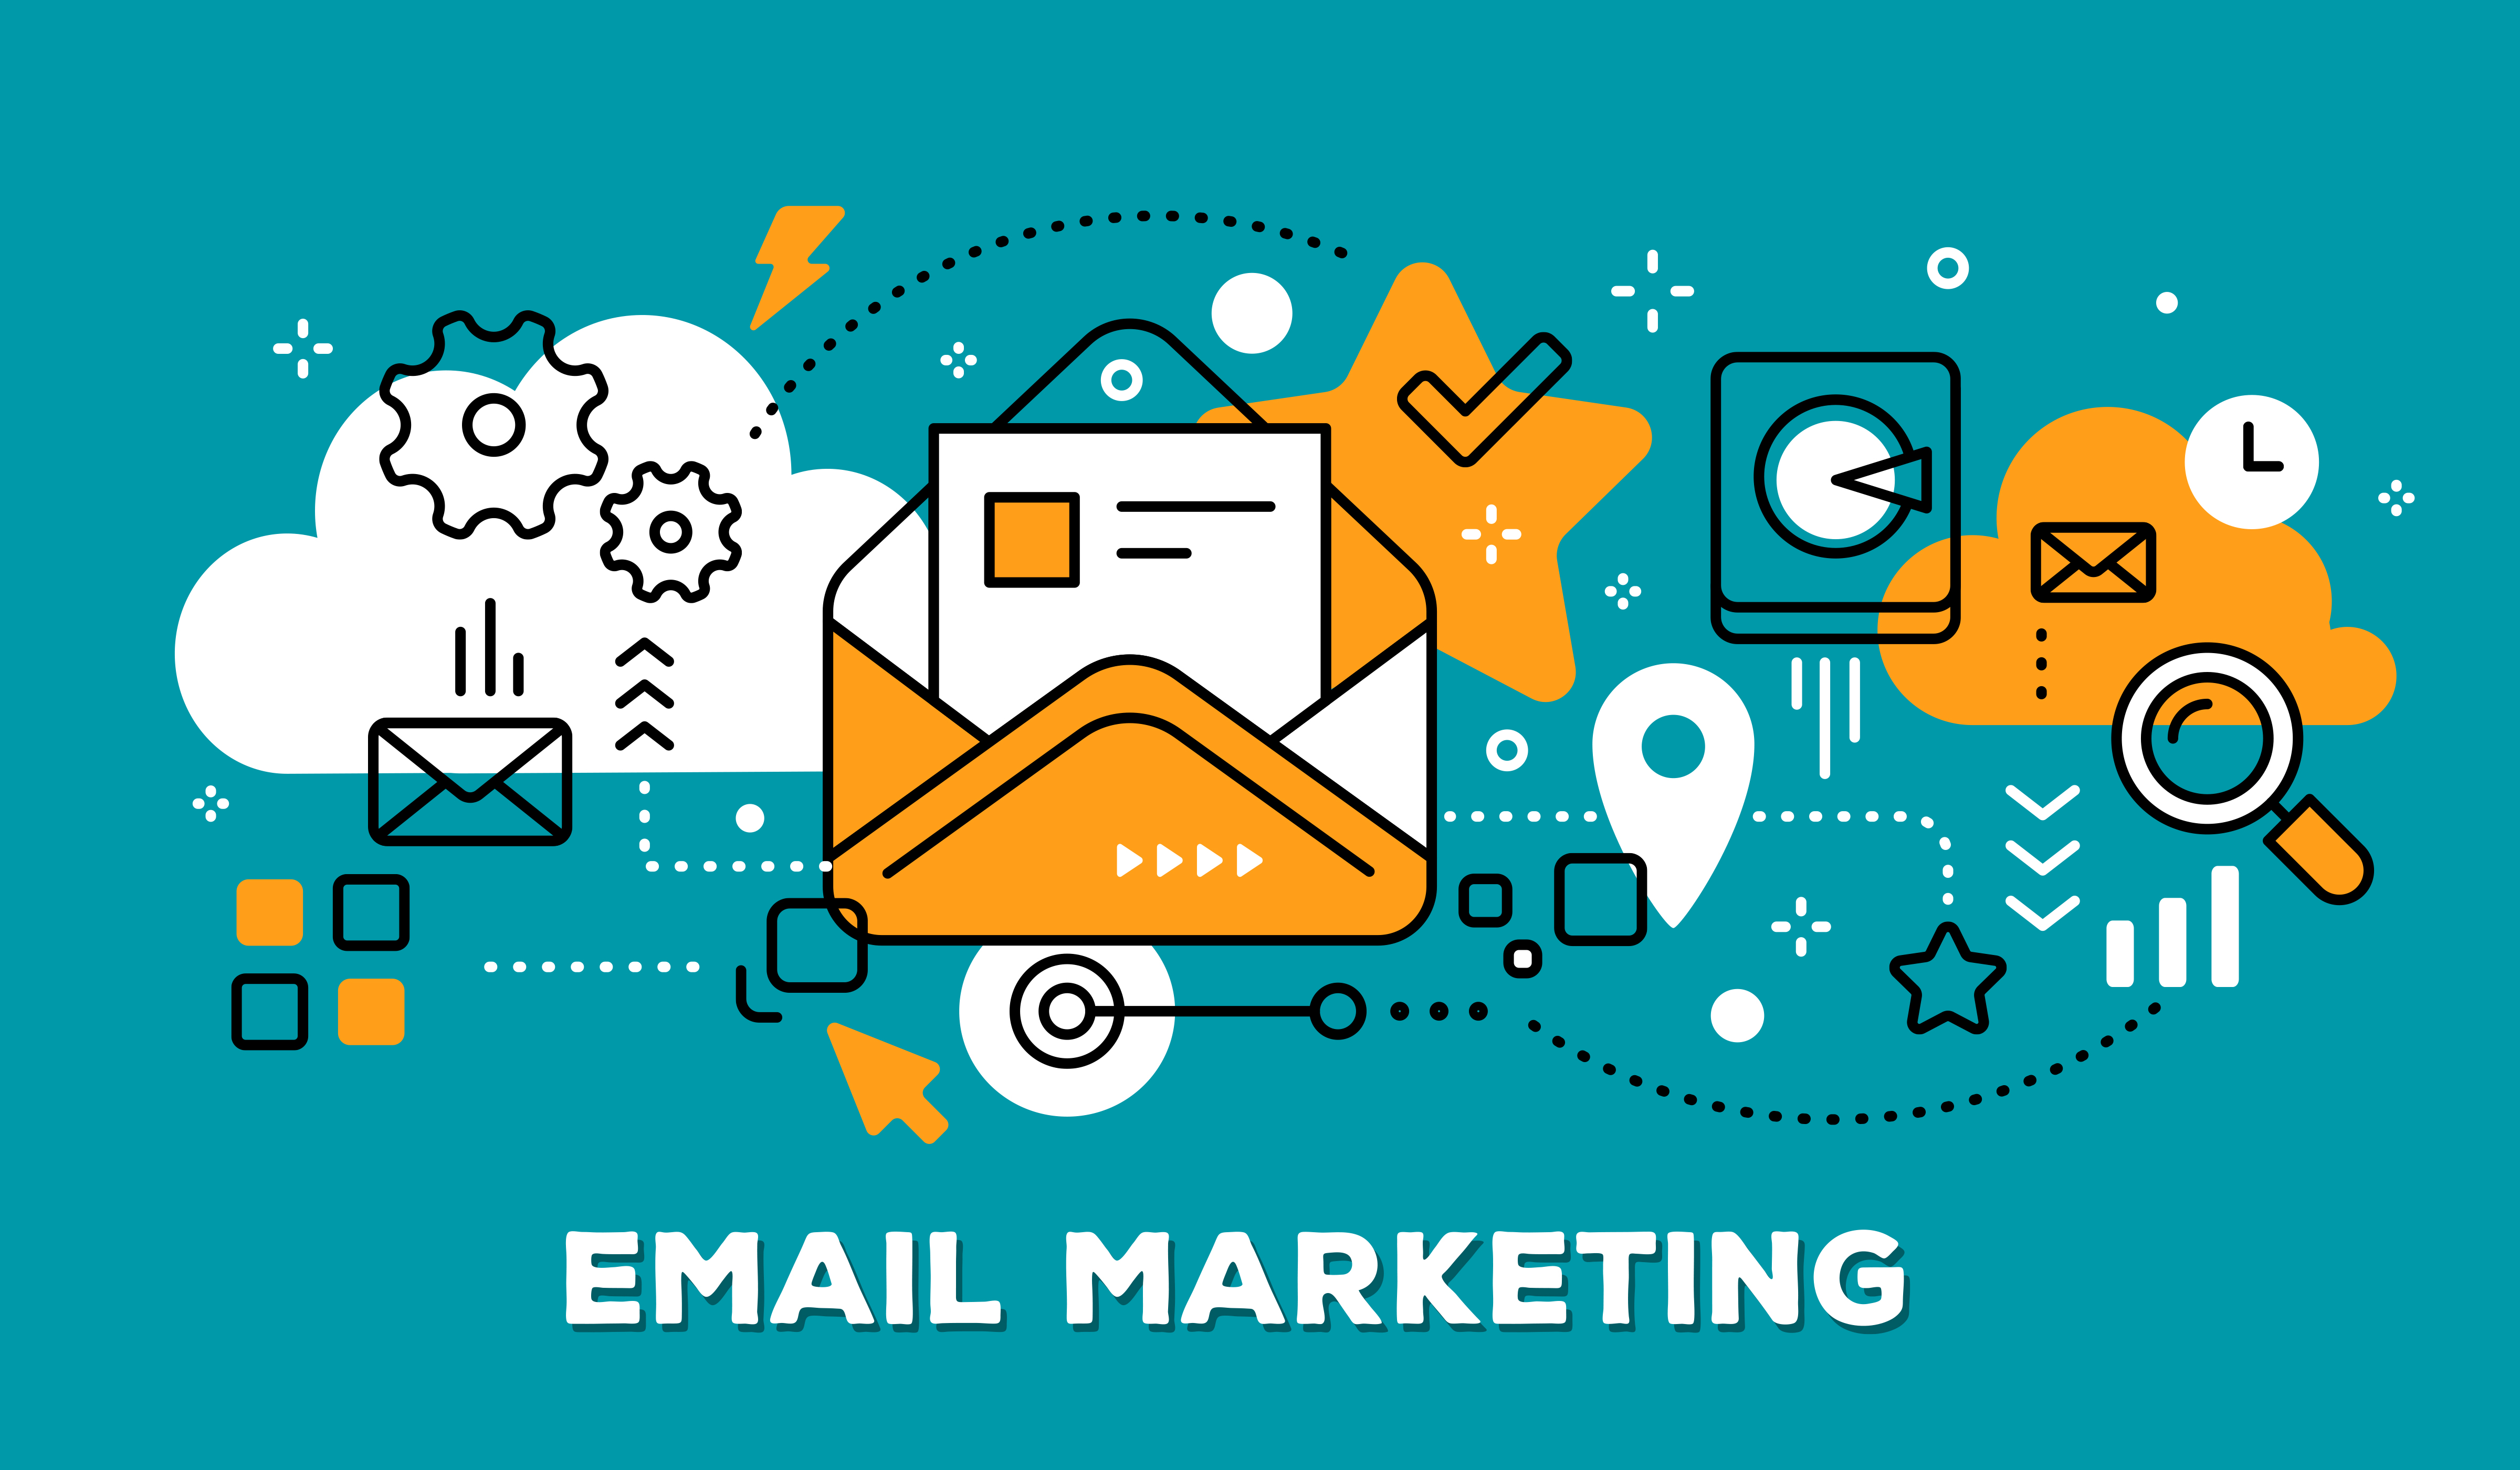 Data e-mail marketing USA 960 millions e-mail 2018 for leads.